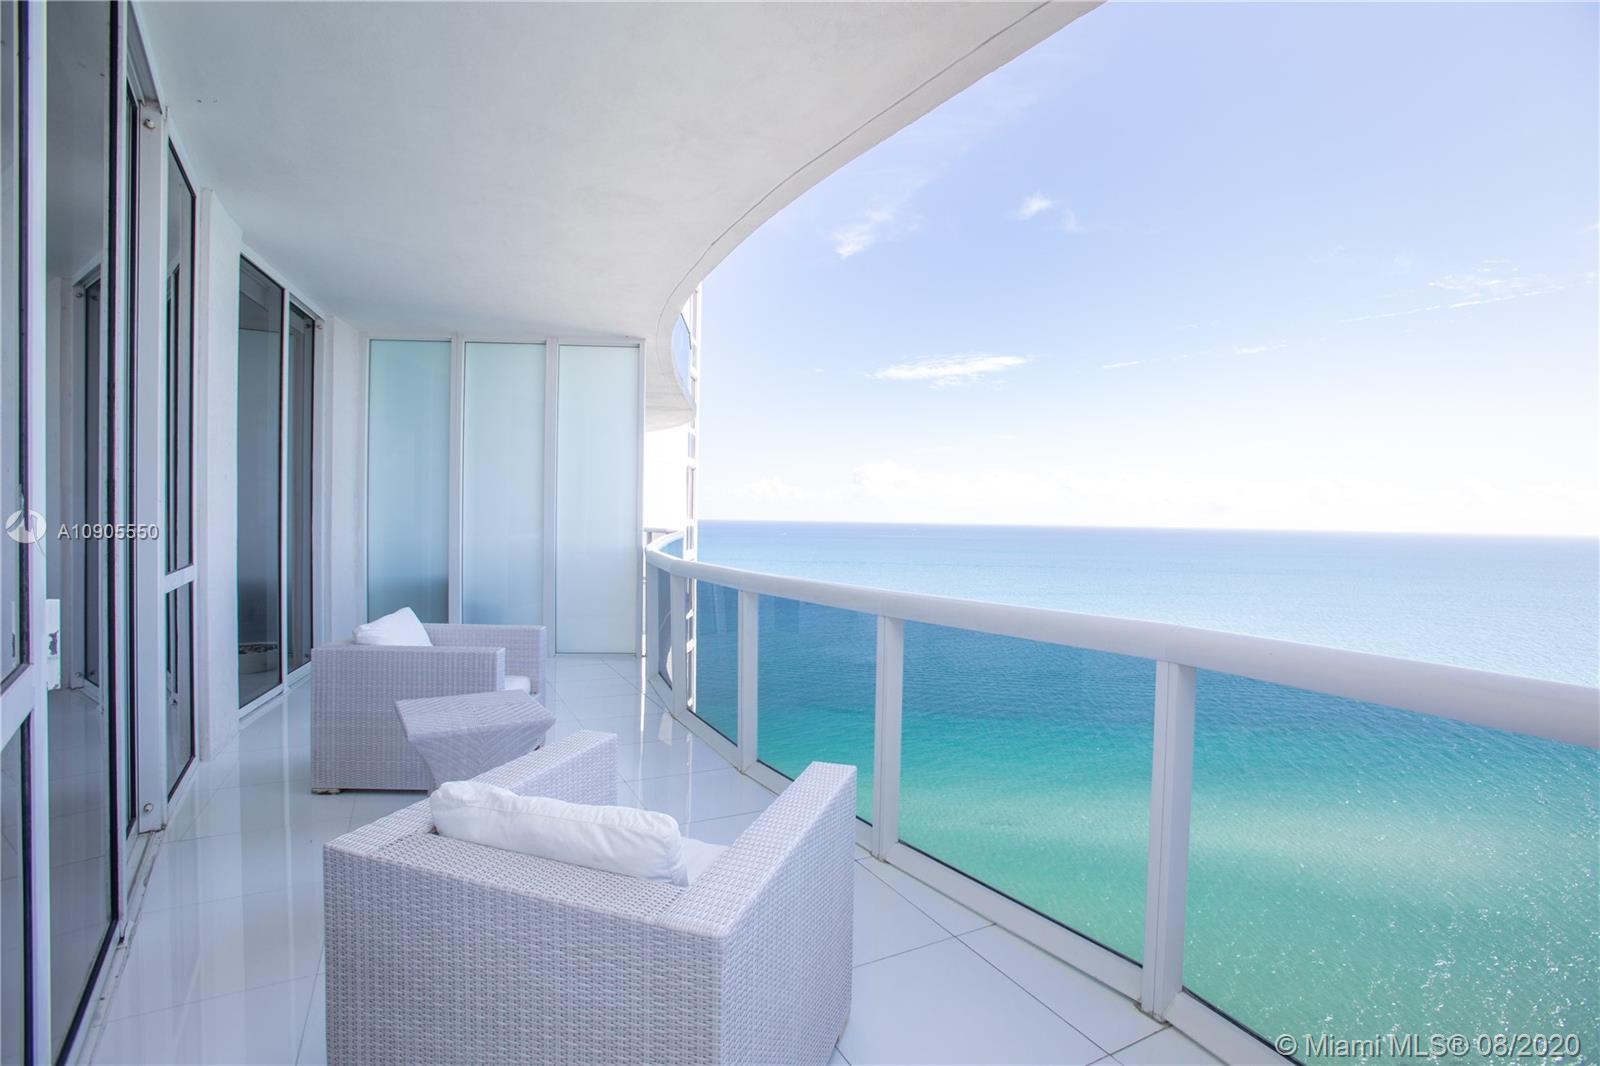 Real Estate Photo A10905550